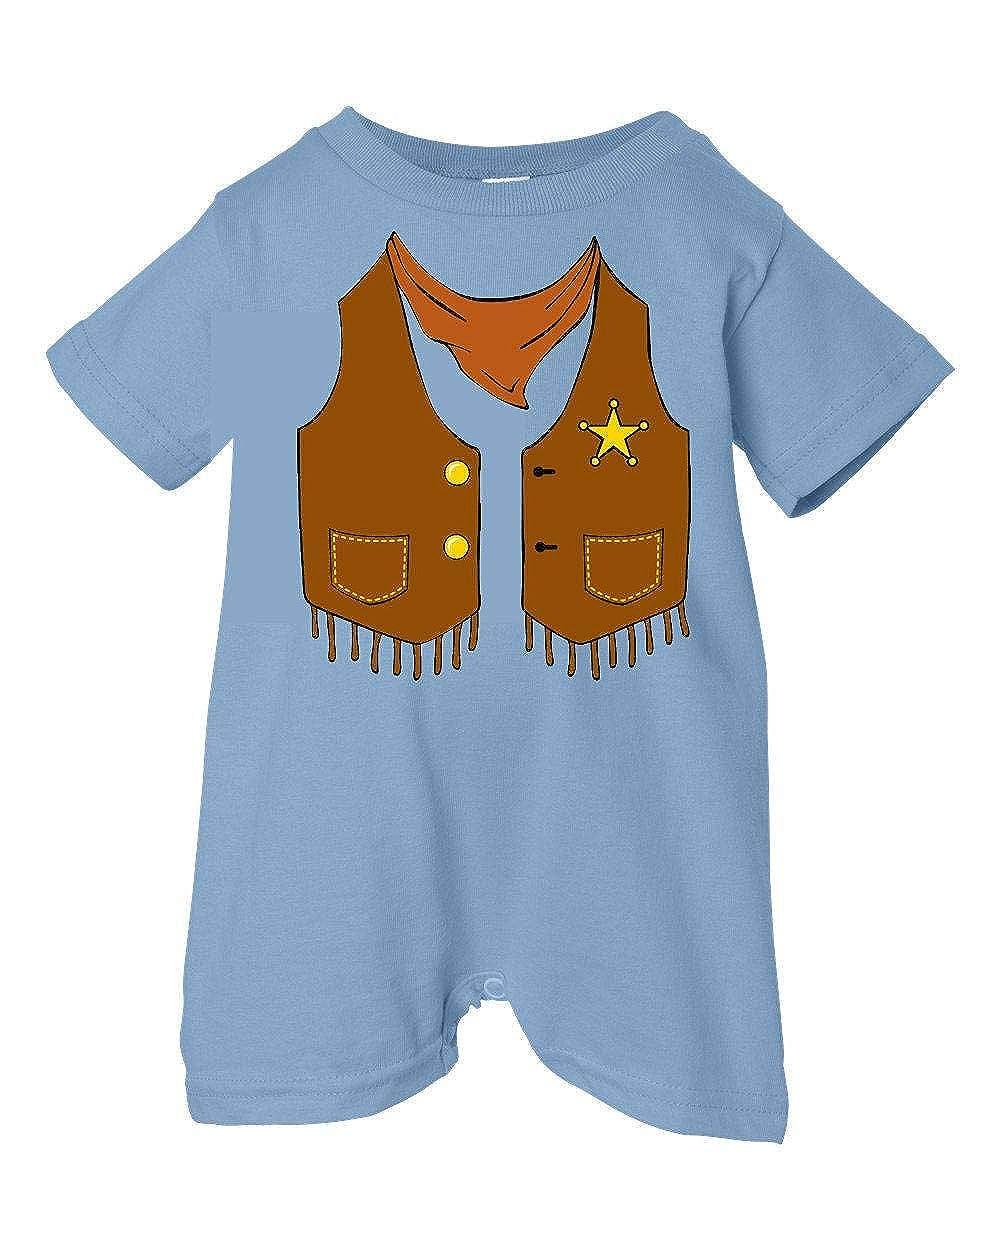 Lt. Blue, 12 Months Festive Threads Unisex Baby Sheriffs Vest T-Shirt Romper